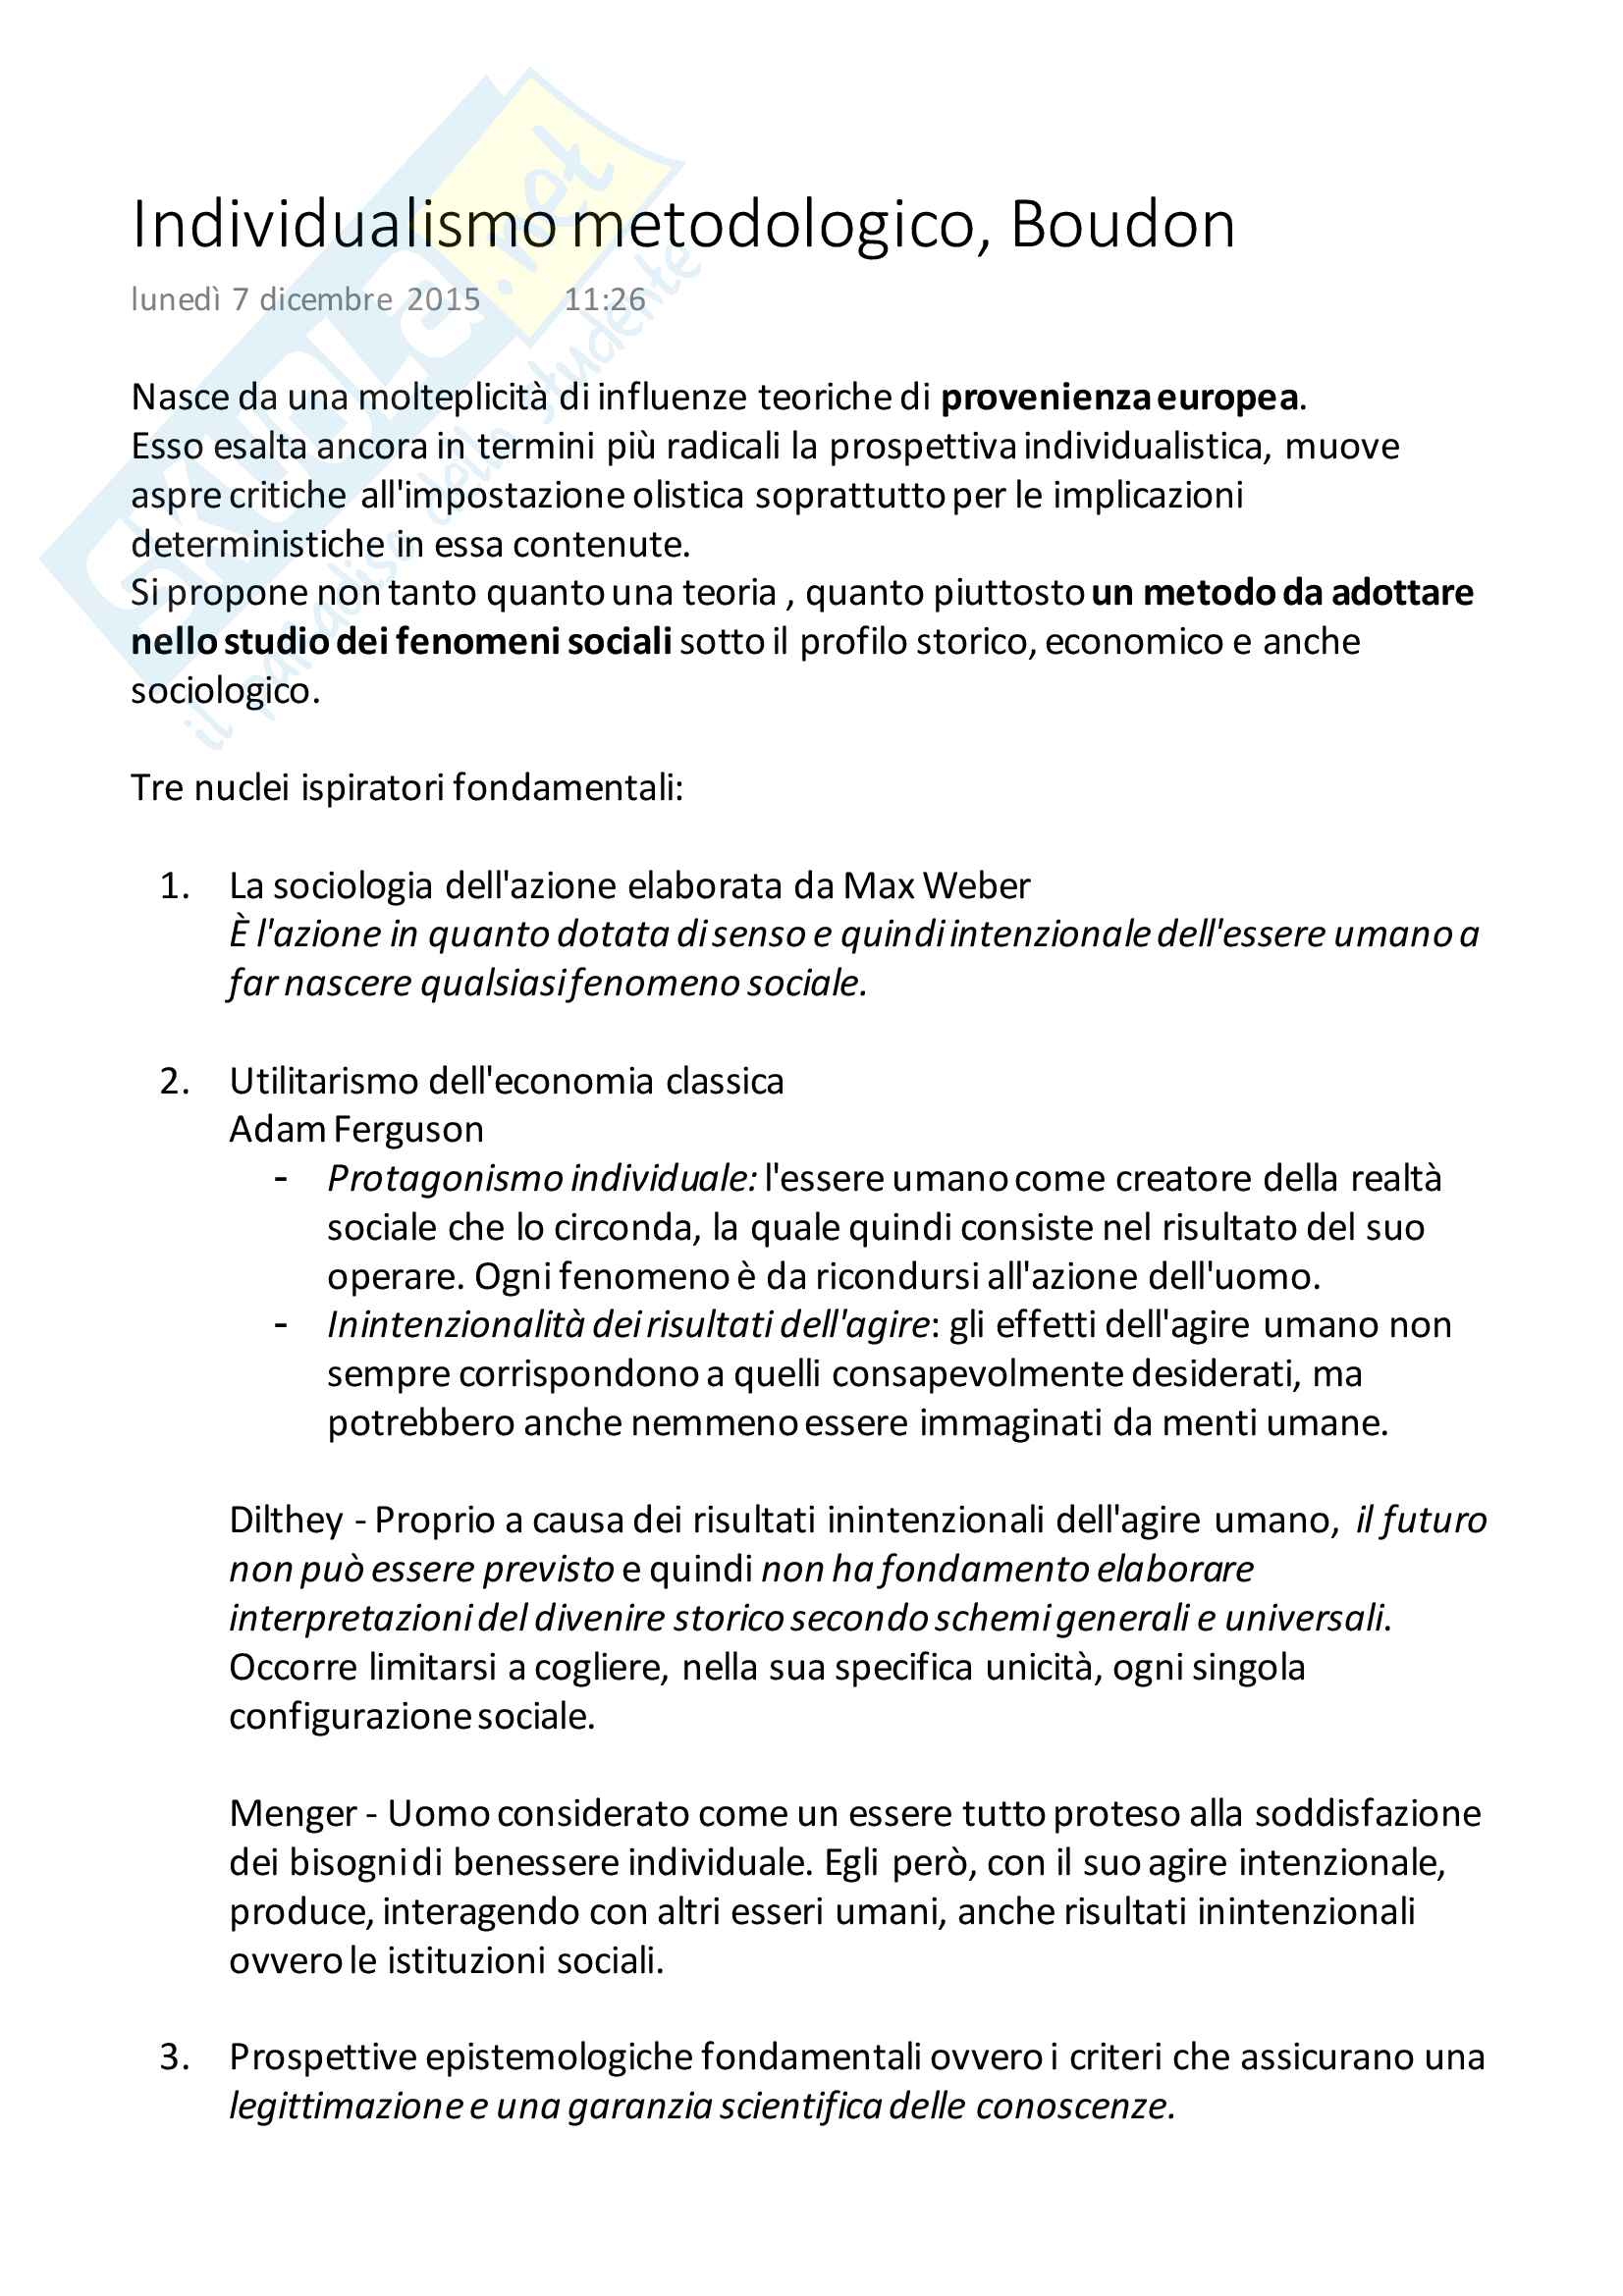 Appunti: Boudon, Individualismo metodologico. Esame di Sociologia Generale, Prof. Rita Bichi